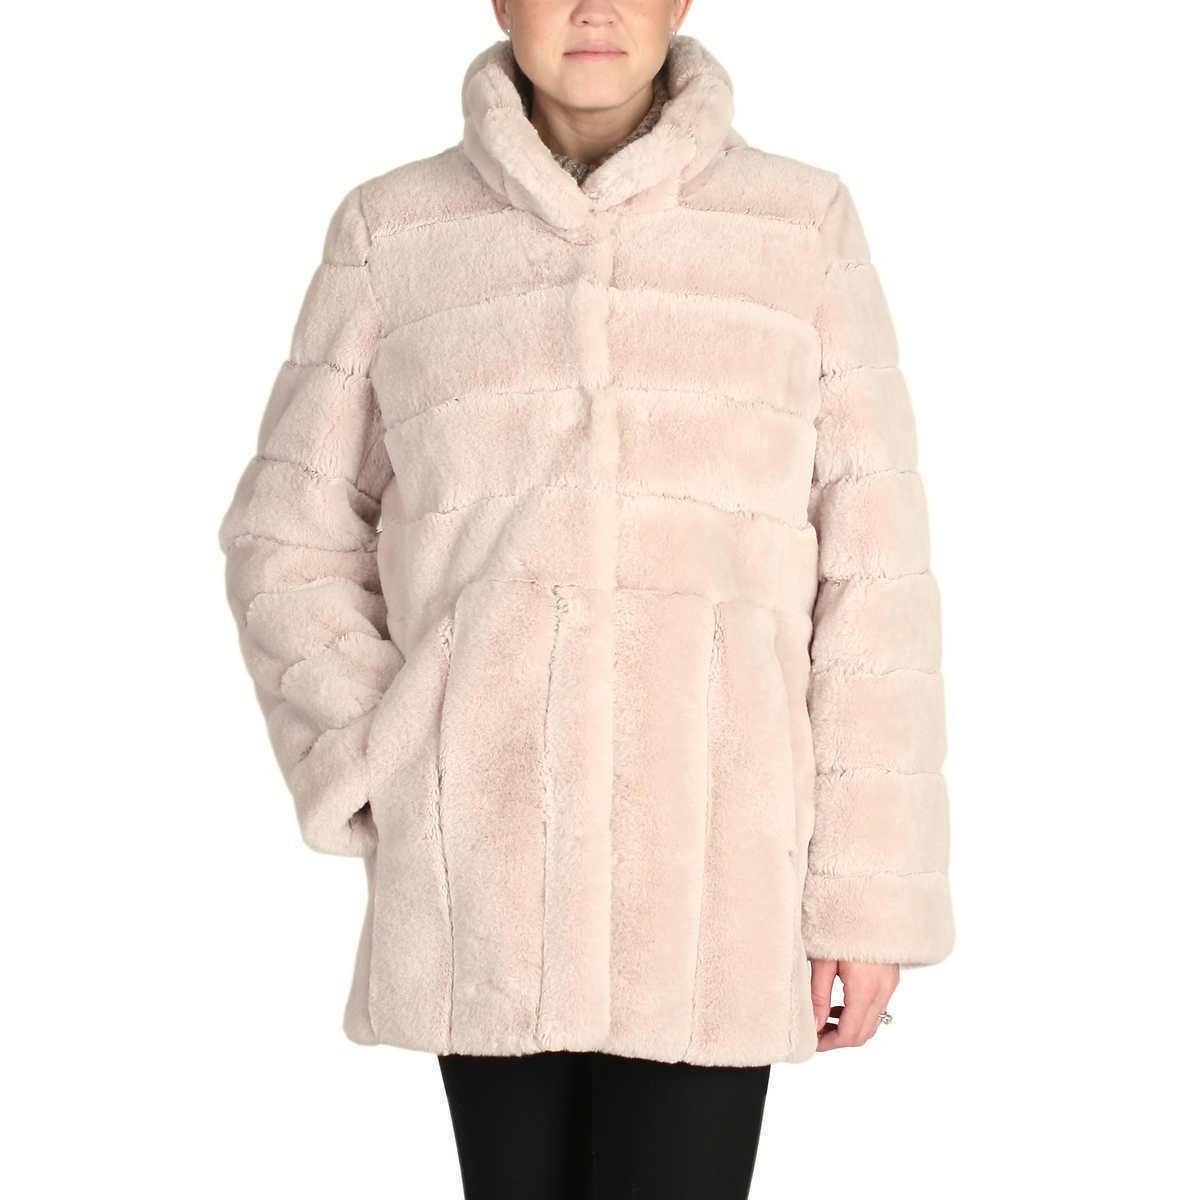 Kristen Blake Women's Ladies' Faux Fur Coat Jacket Size M NWT